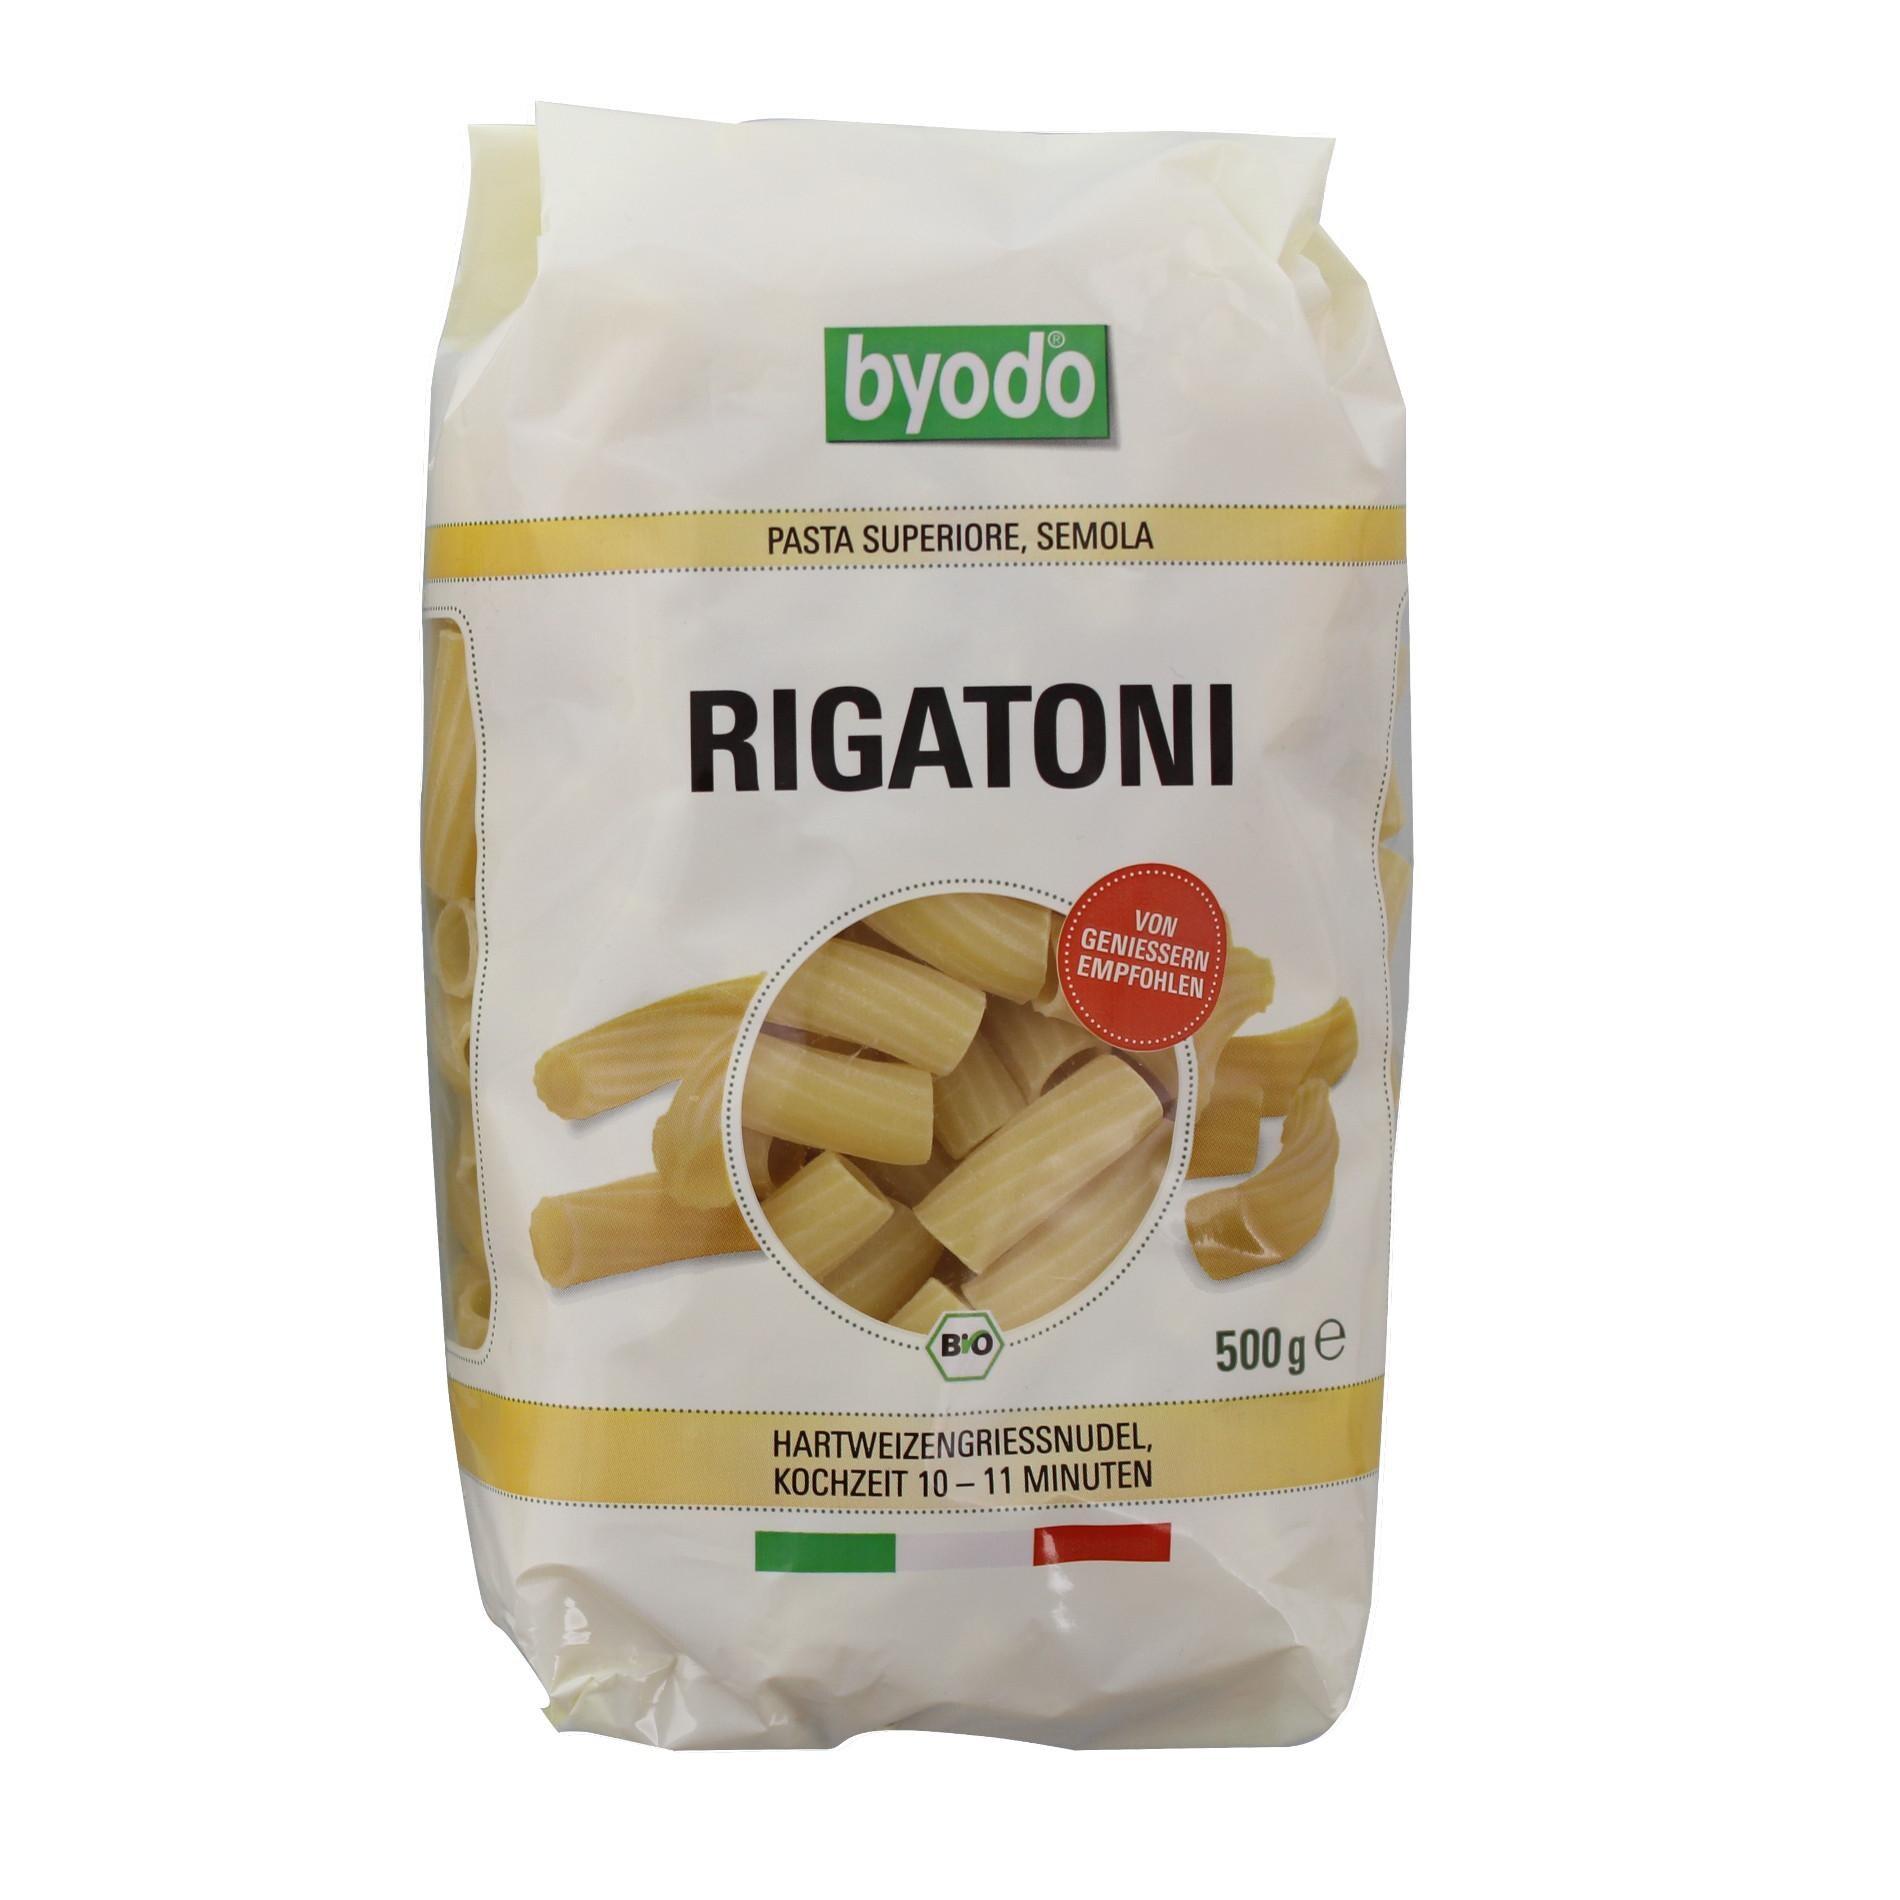 Byodo Bio Pasta Rigatoni 500g